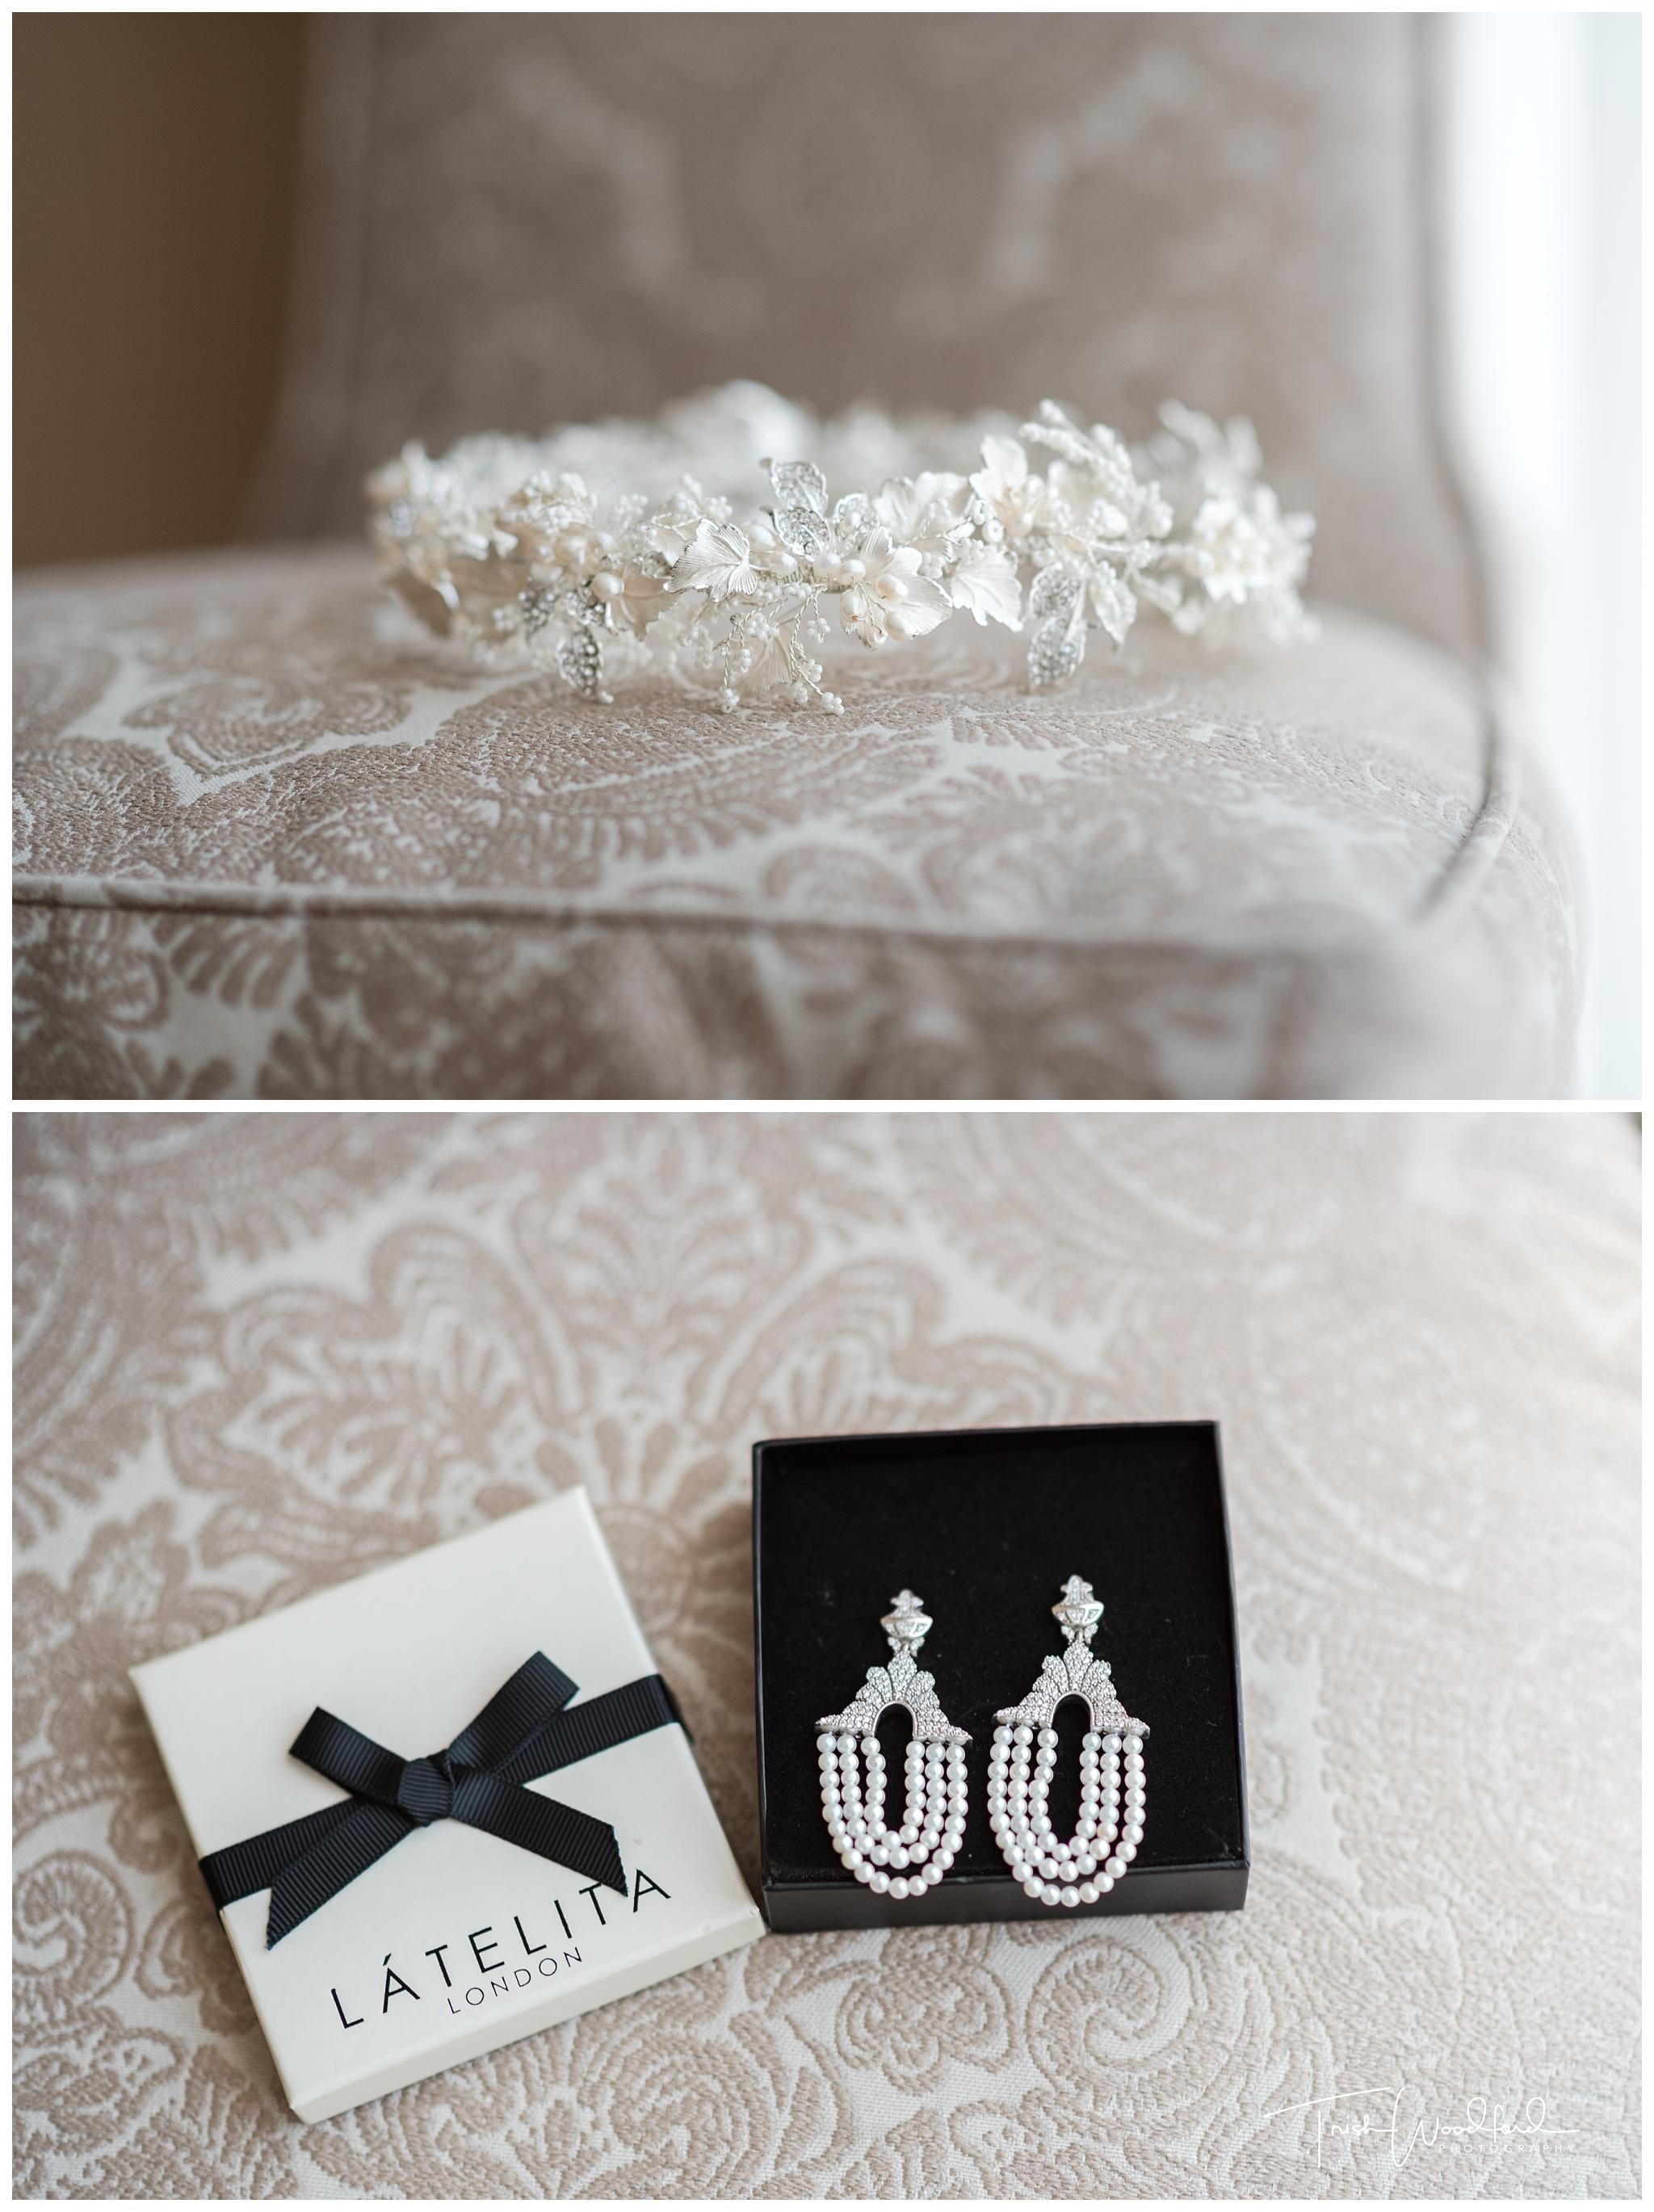 Perth Bride Details